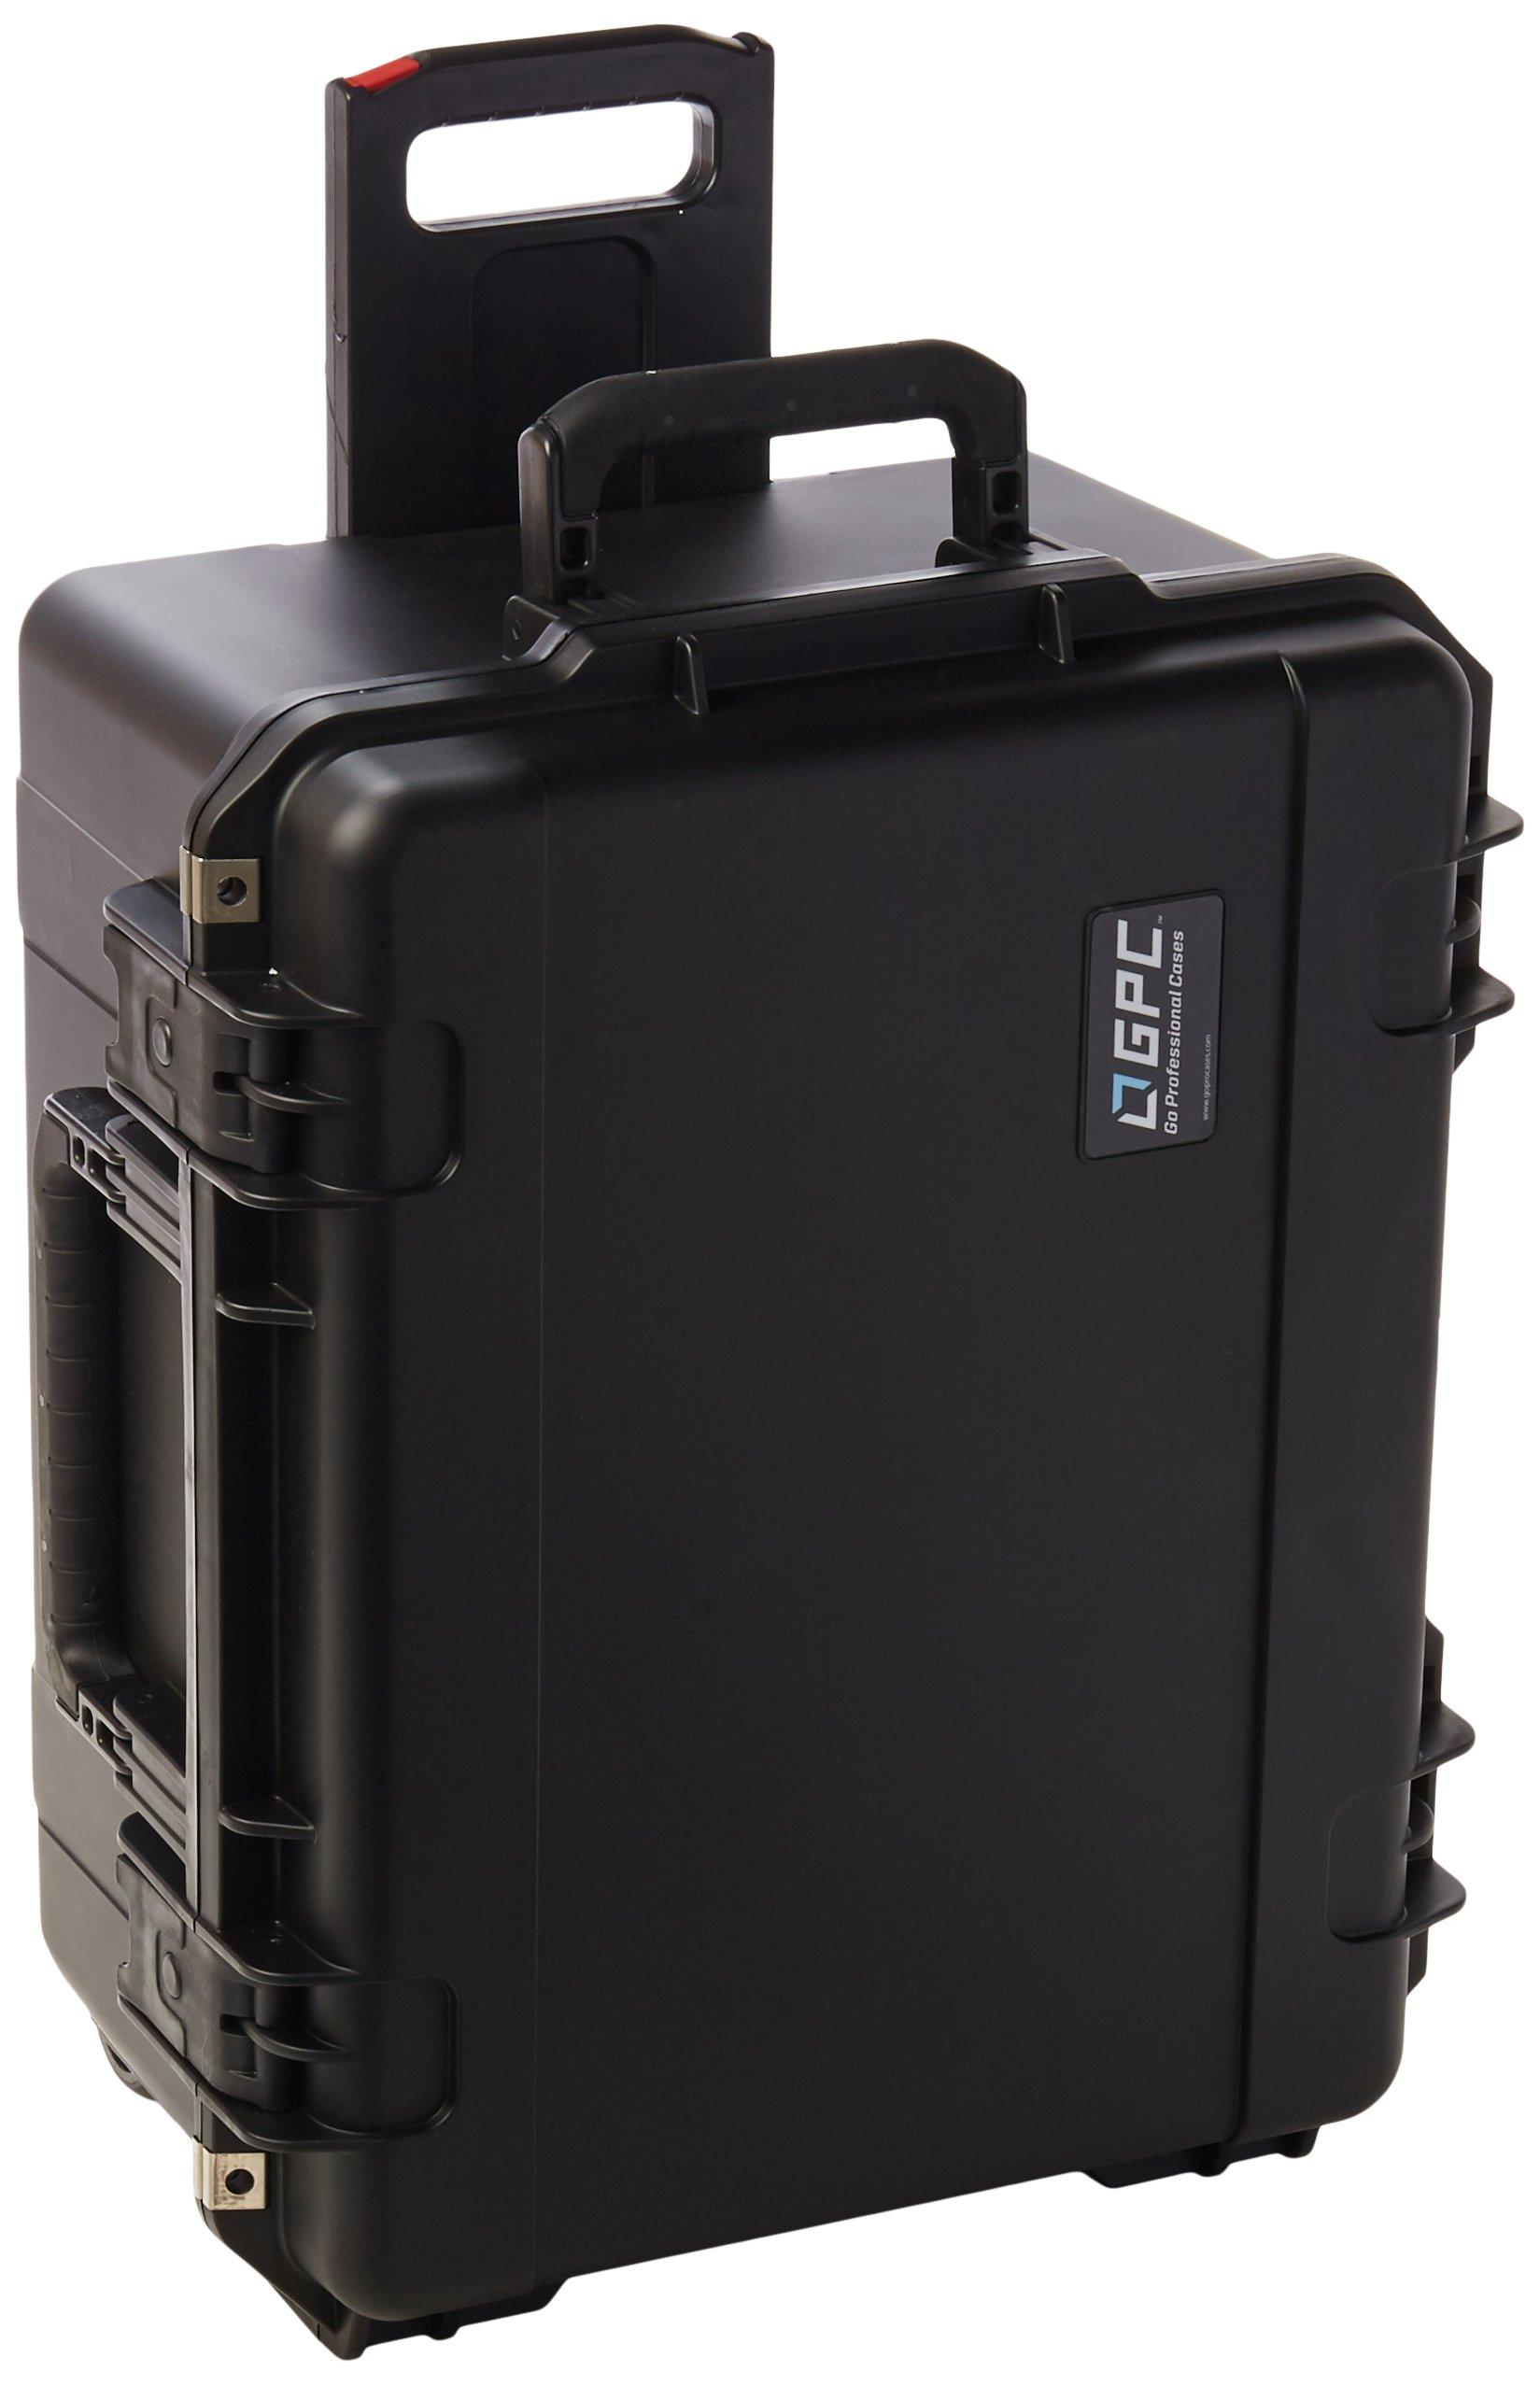 Go Professional Cases DJI Phantom 3 Plus Watertight Hard Case